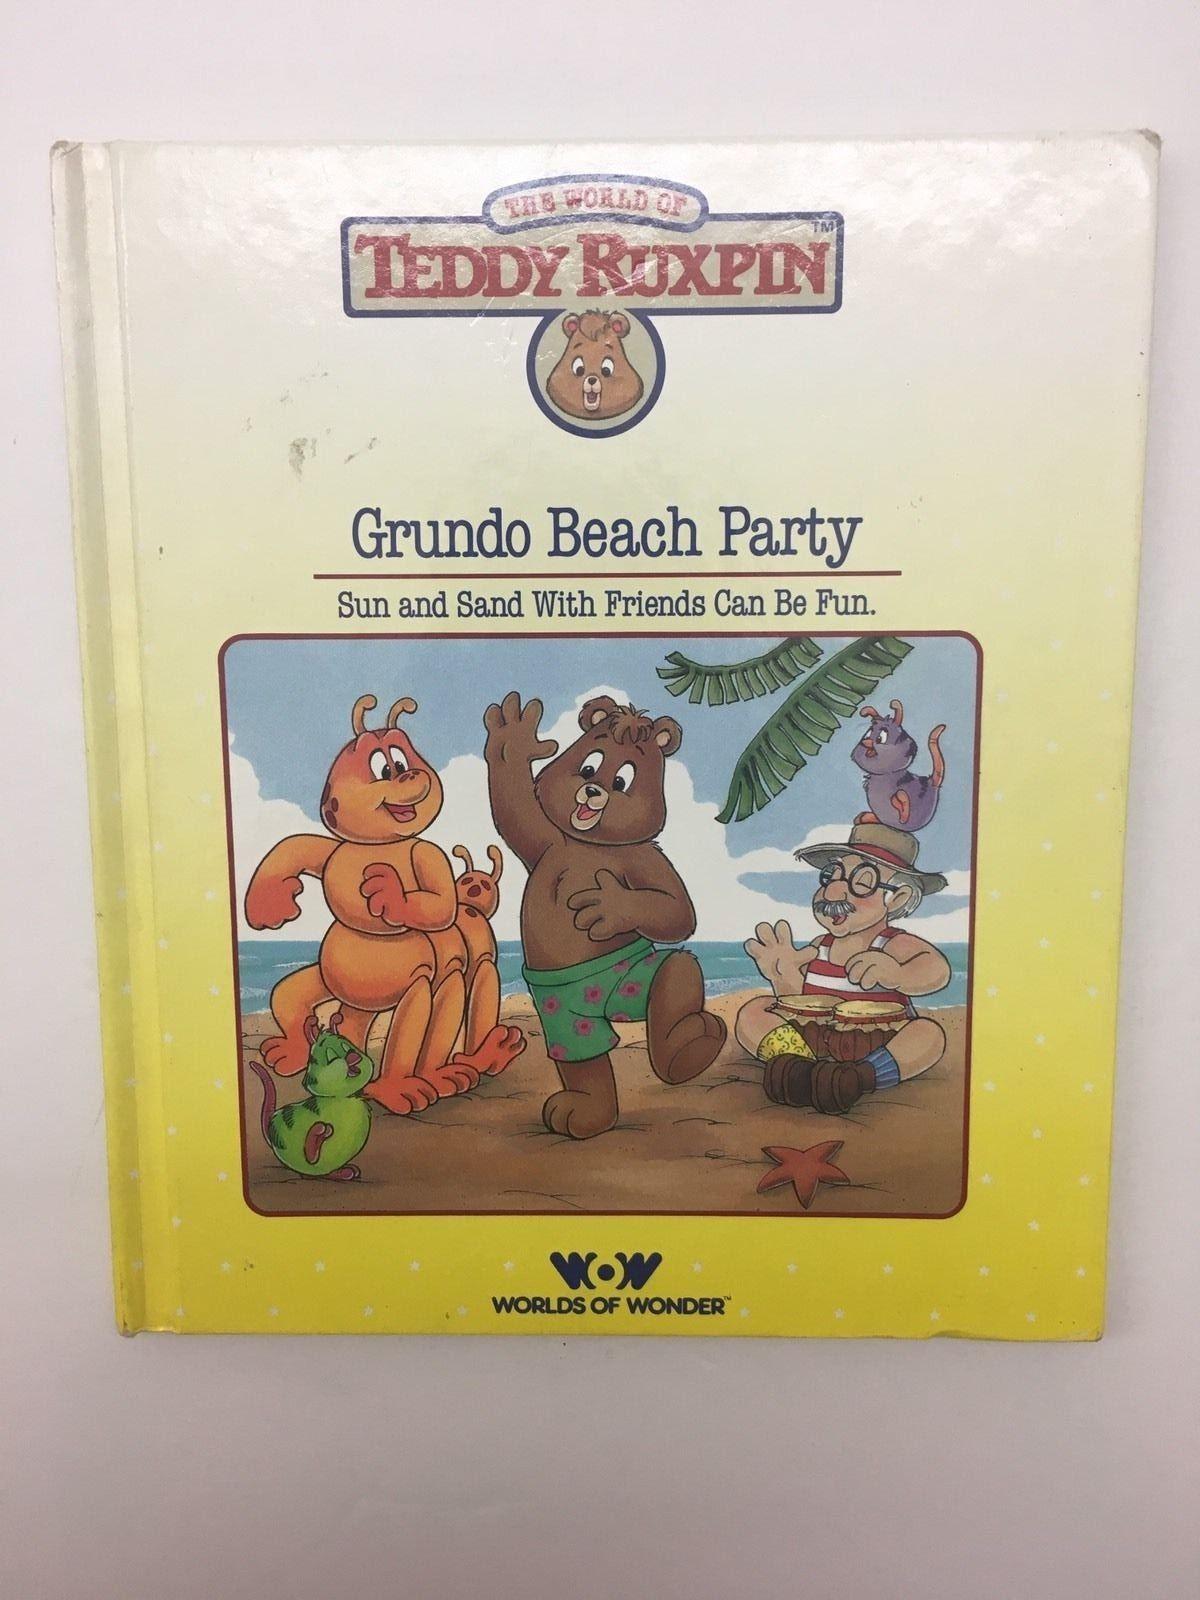 The World of Teddy Ruxpin Grundo Beach Party Book 1986 Worlds of Wonder